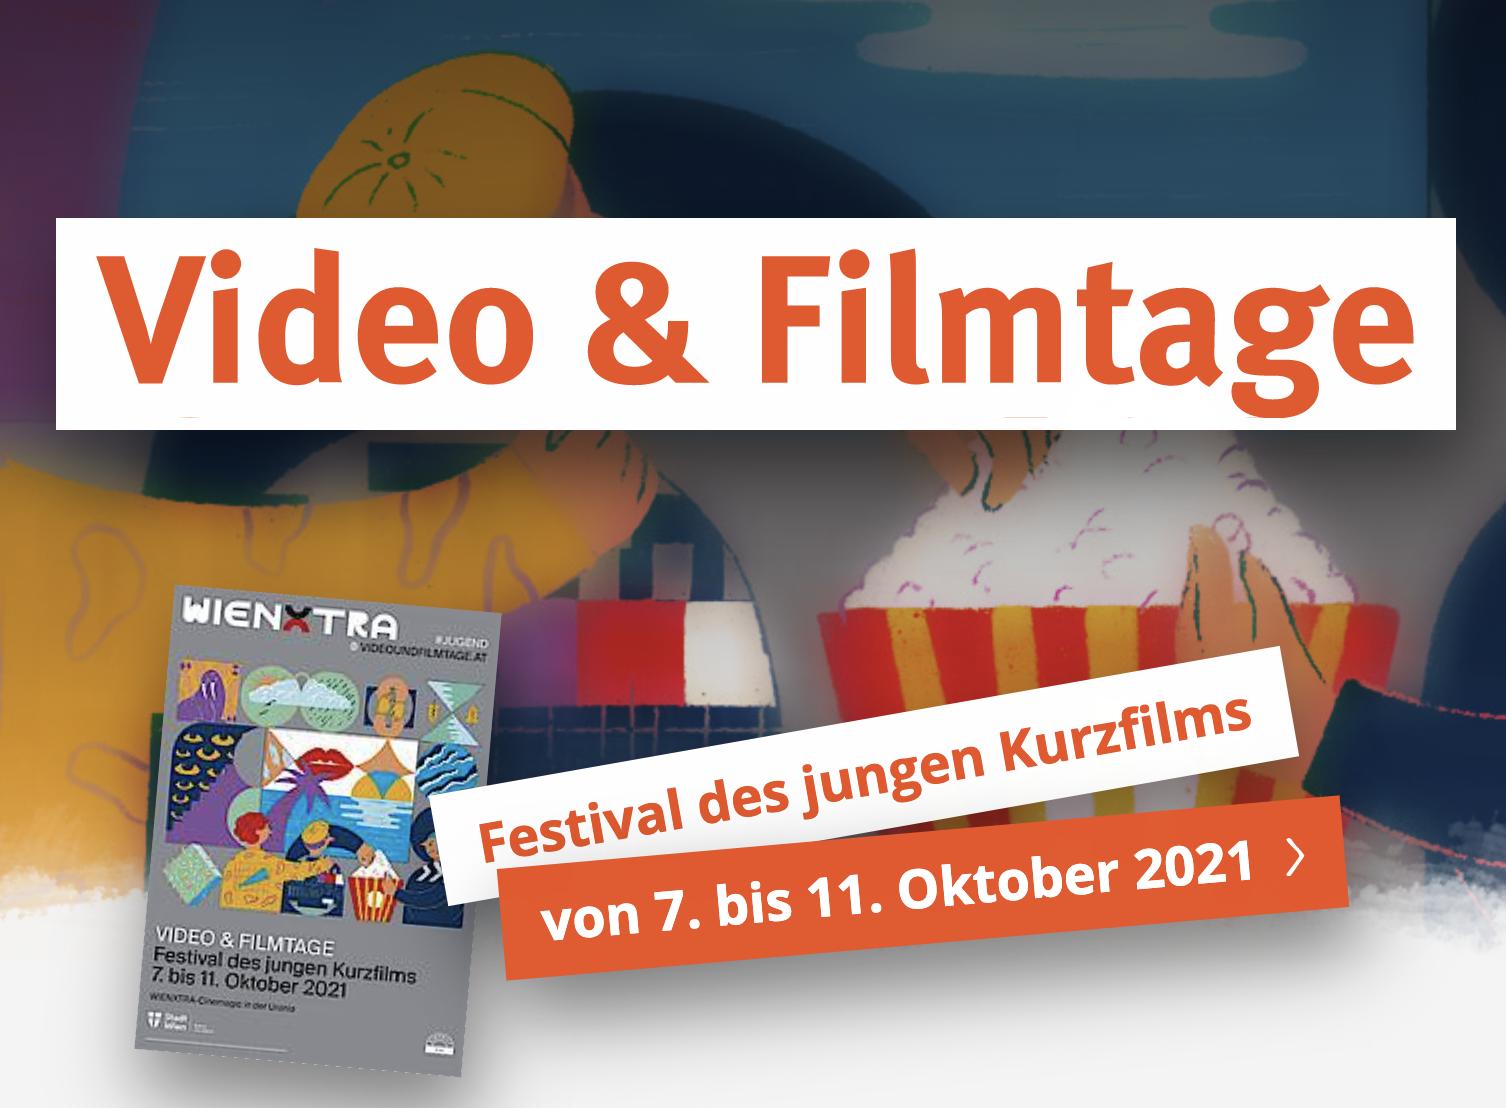 Video & Filmtage 2021